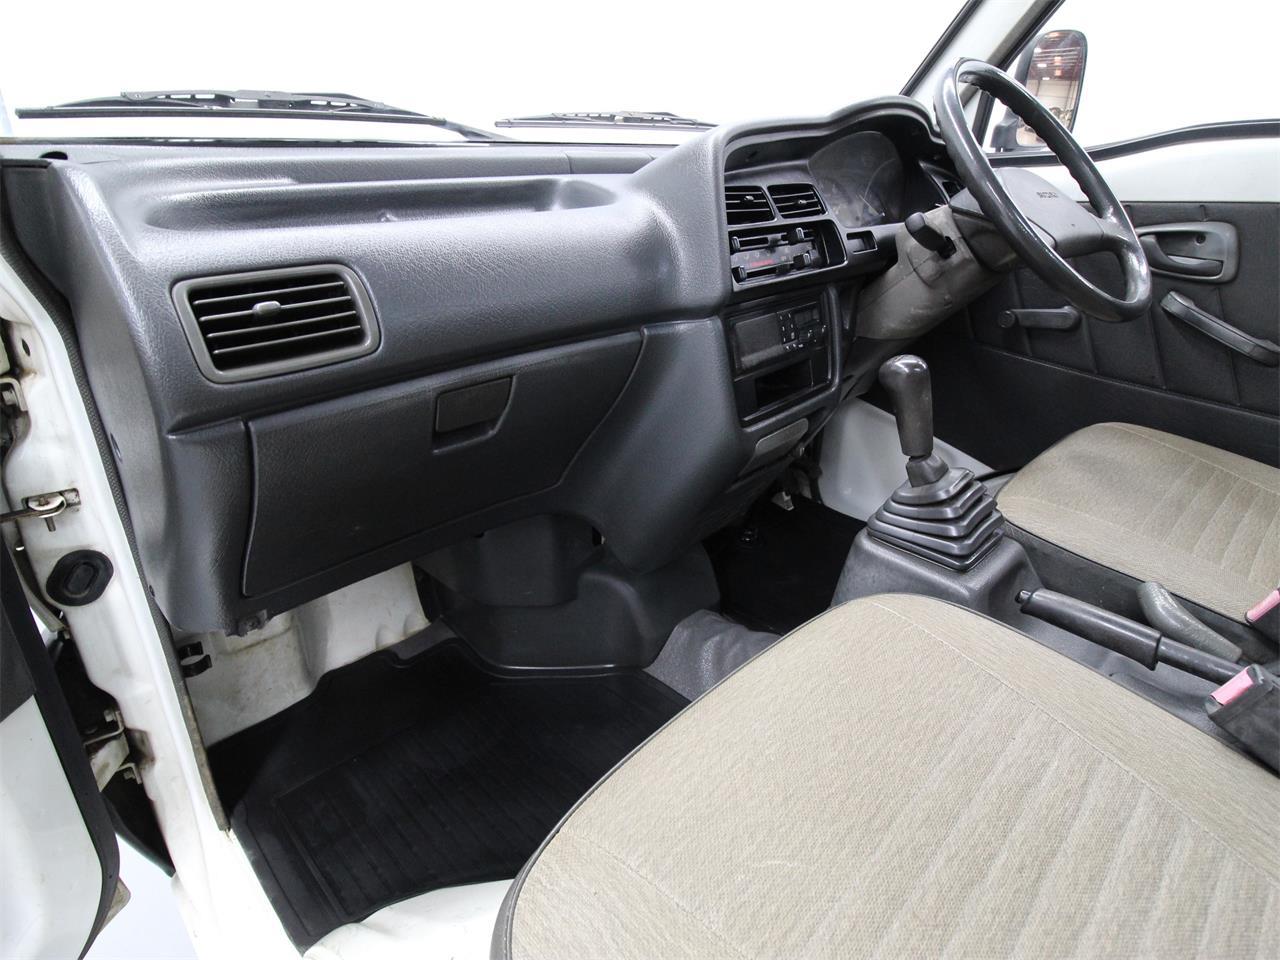 1993 Suzuki Carry (CC-1303446) for sale in Christiansburg, Virginia